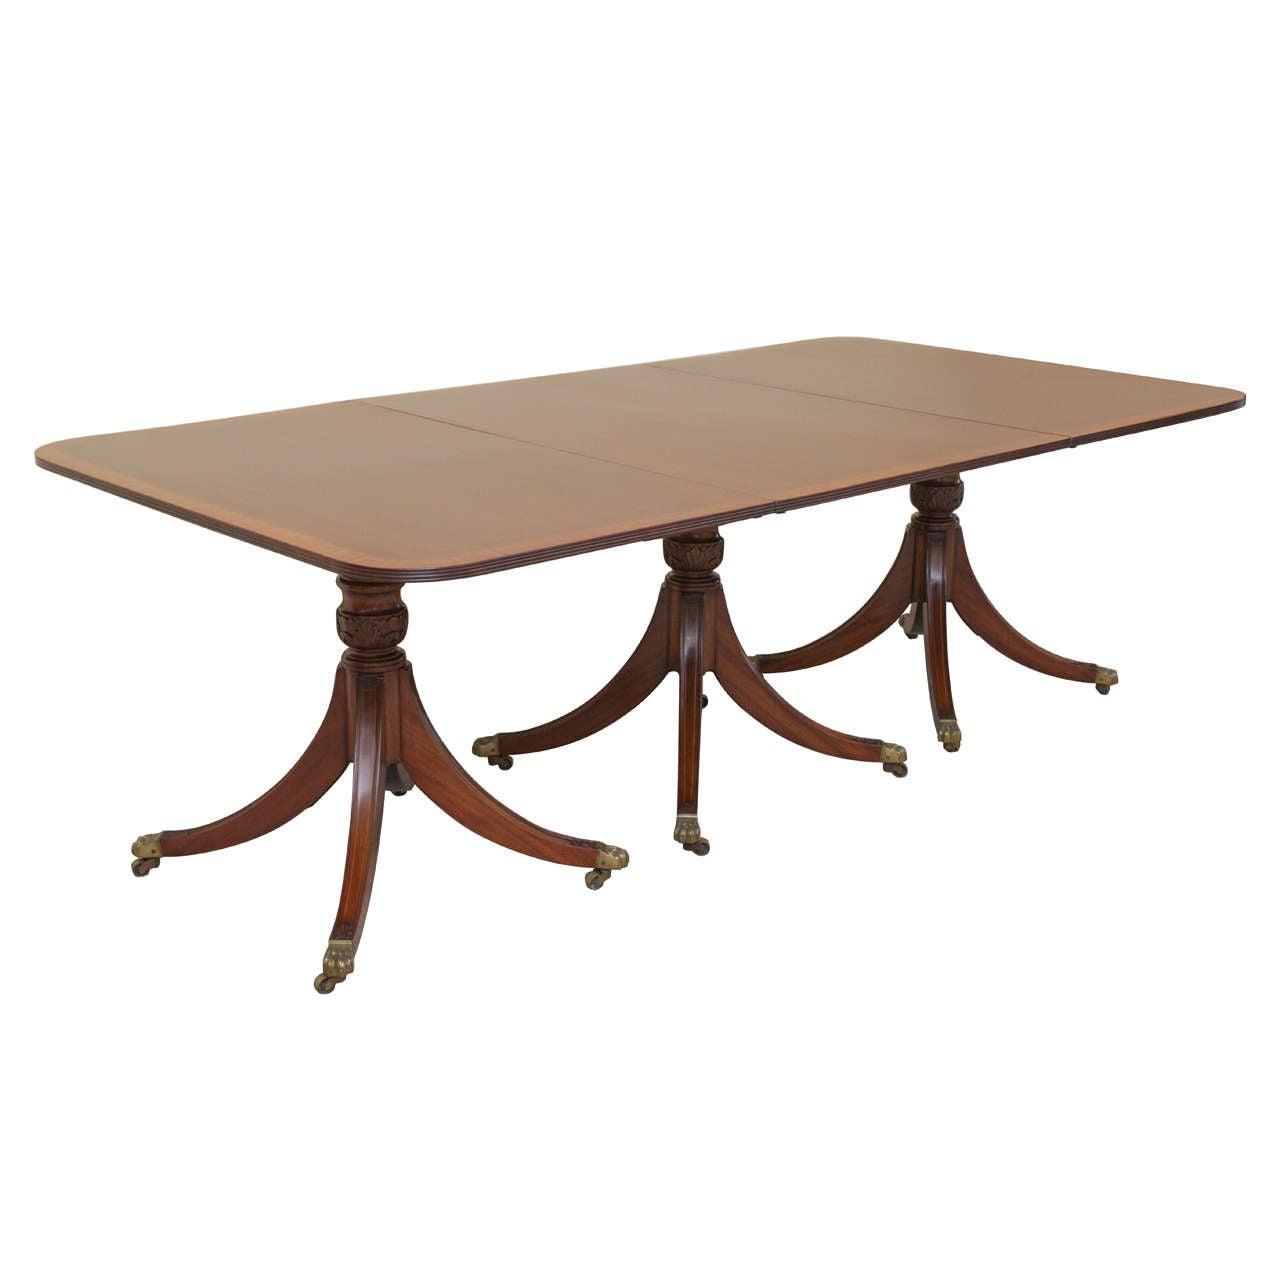 19th Century Regency Triple Pedestal Dining Table